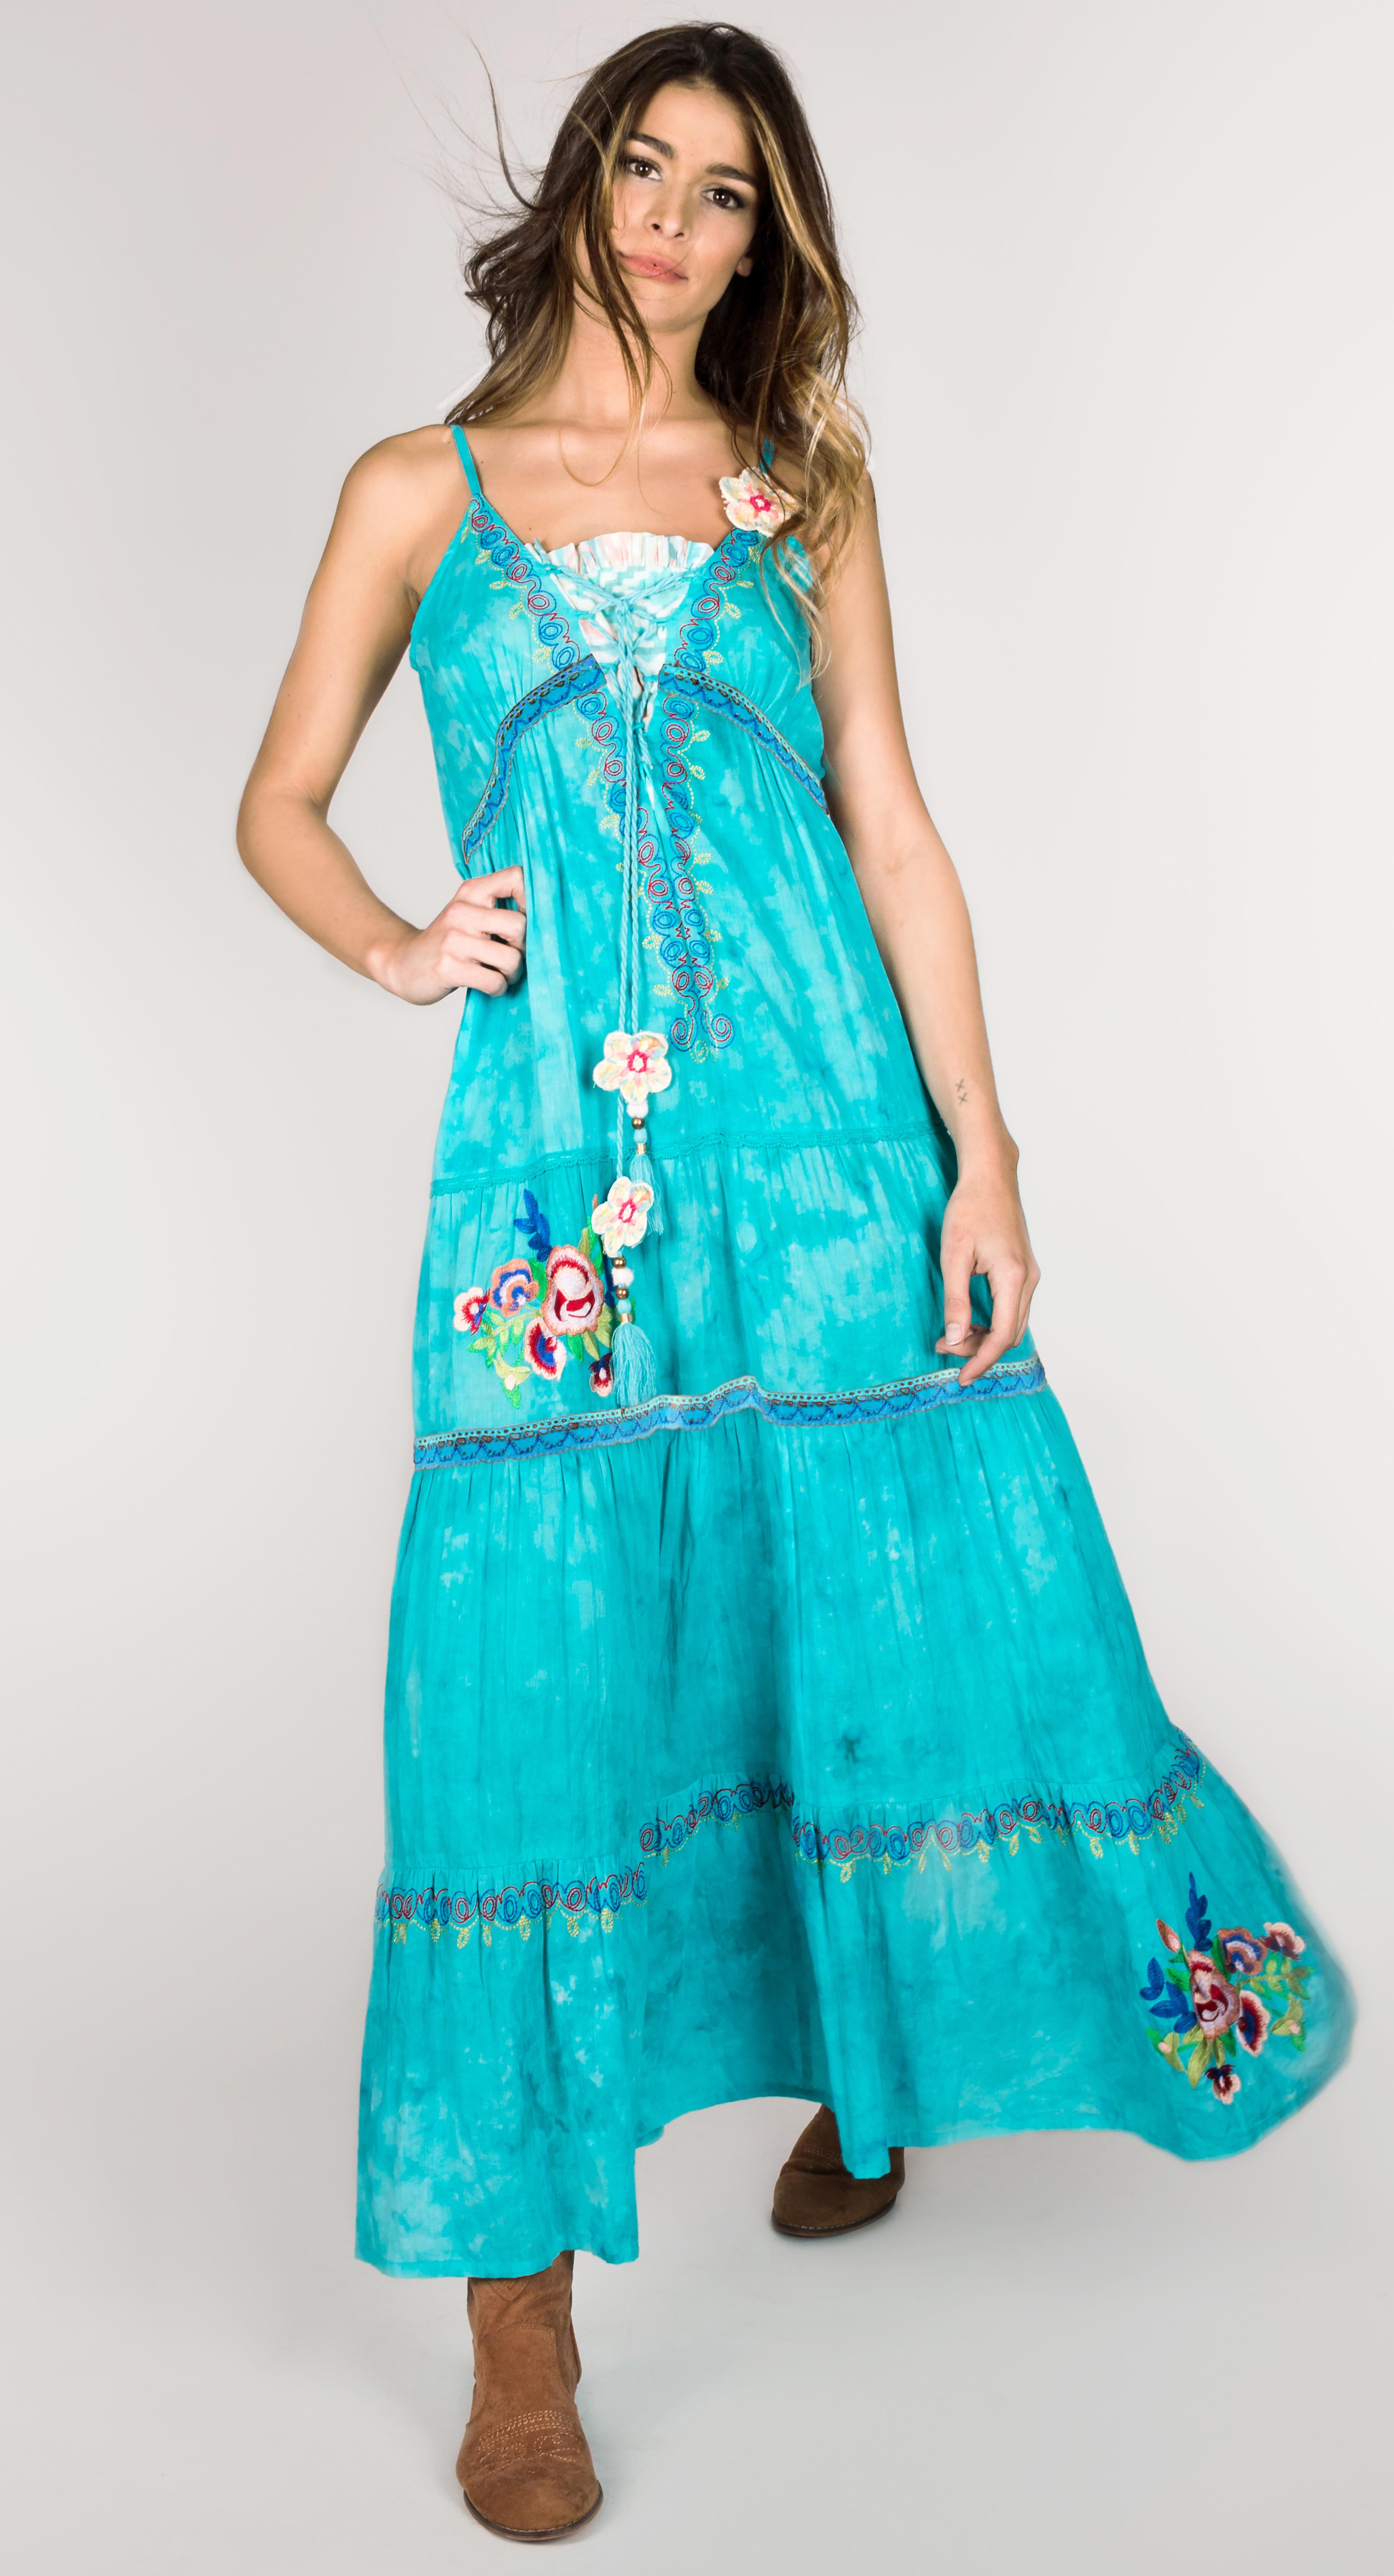 Shoklett: High Low Corset Tied Bodice Sea Flower Maxi Dress Sherlyn SHOKLETT_10022S19DR_N